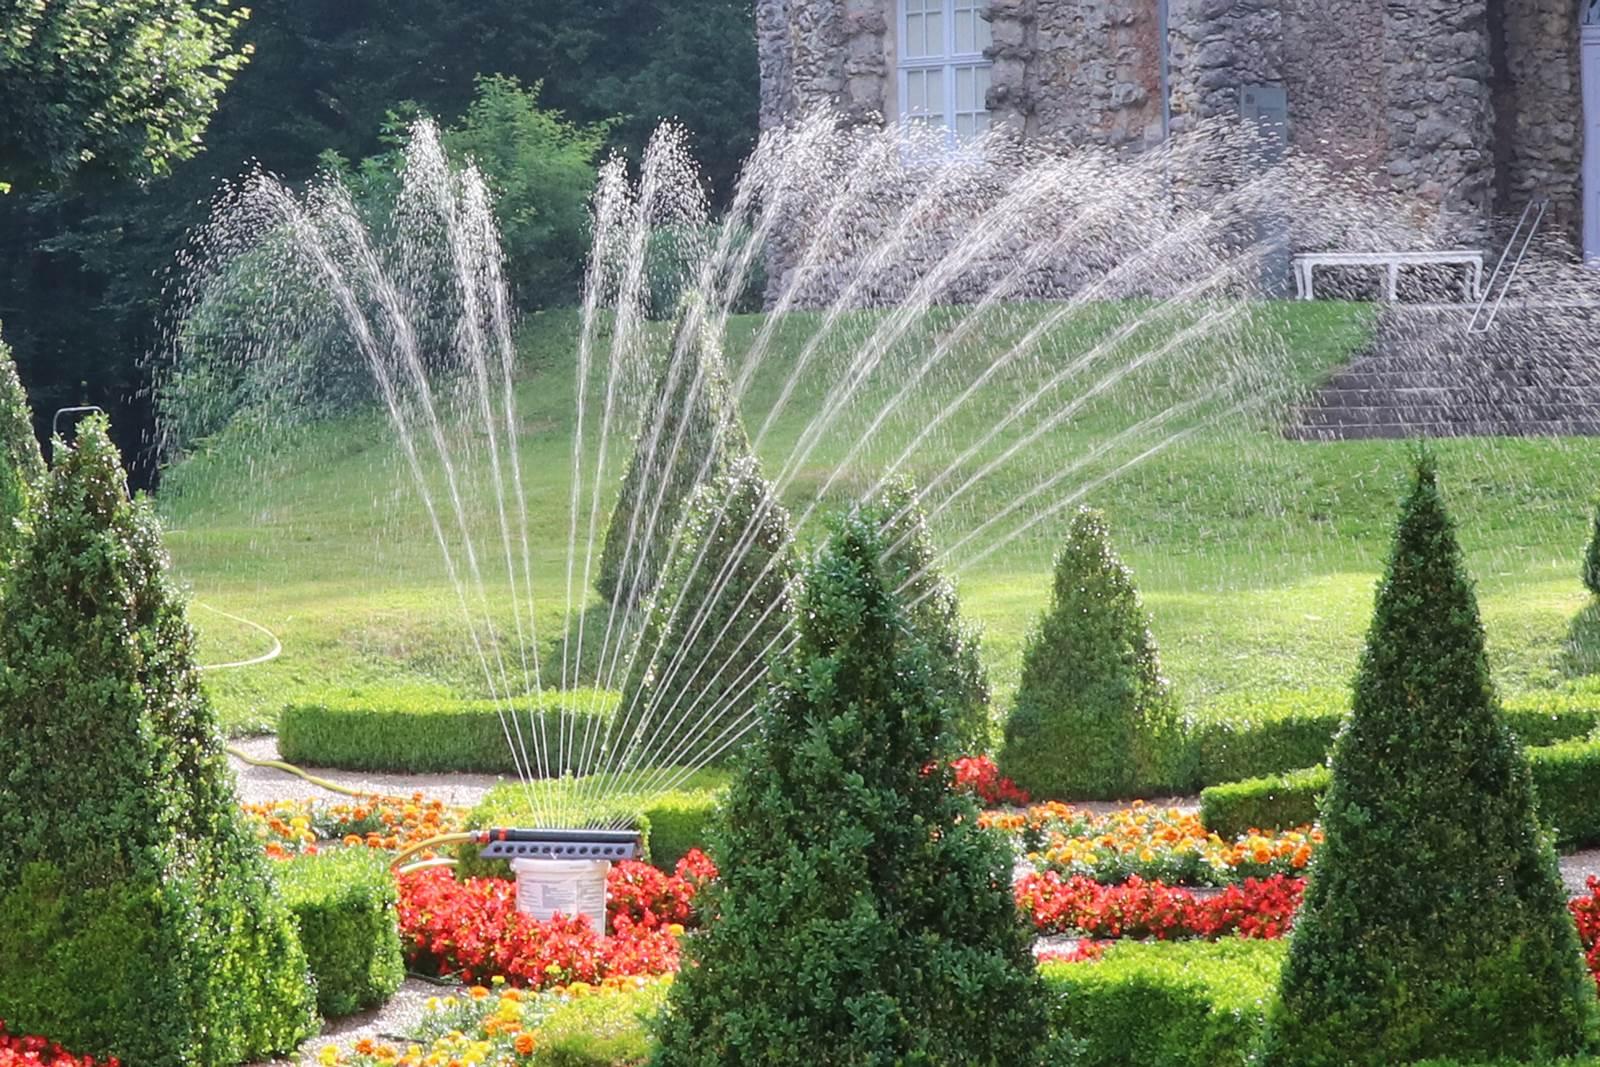 Comment Arroser Jardin Pendant Vacances arroser sans gaspiller au jardin - la terre est un jardin